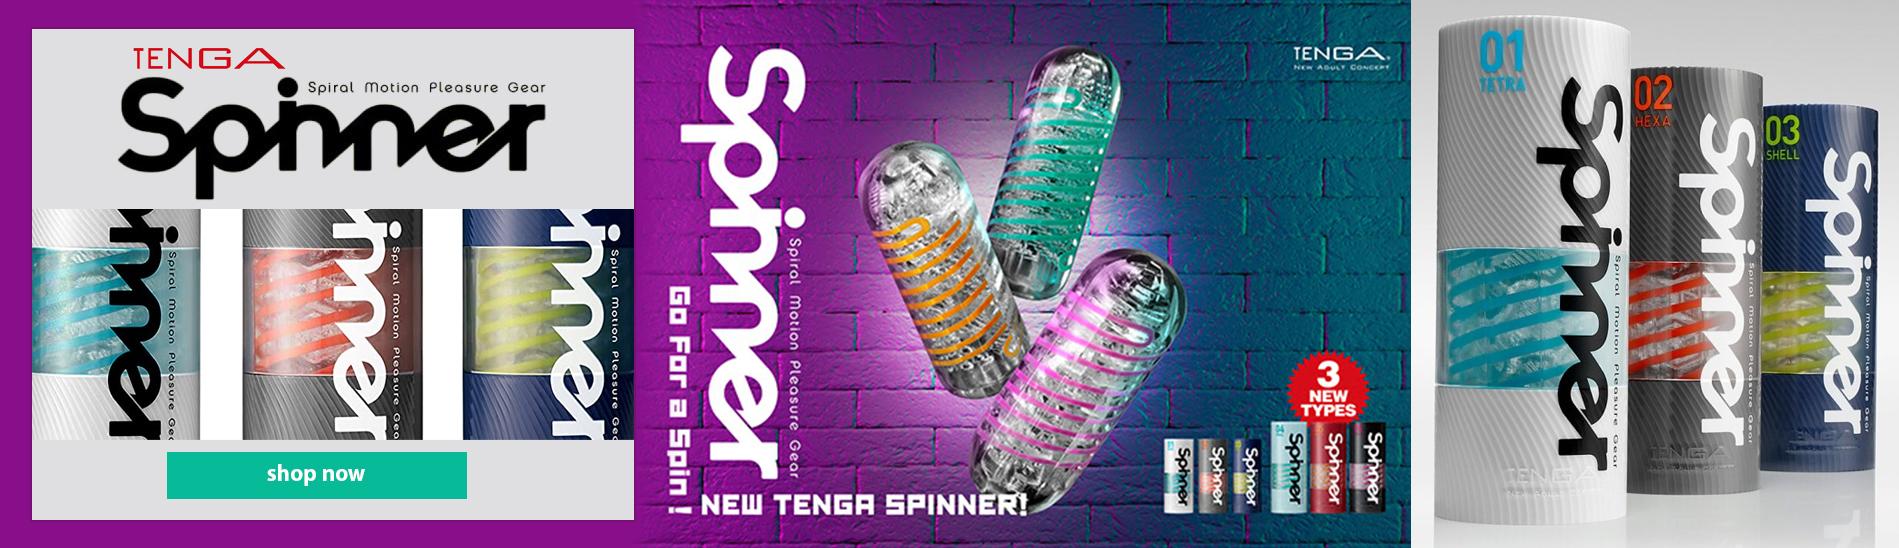 Tenga Spinner